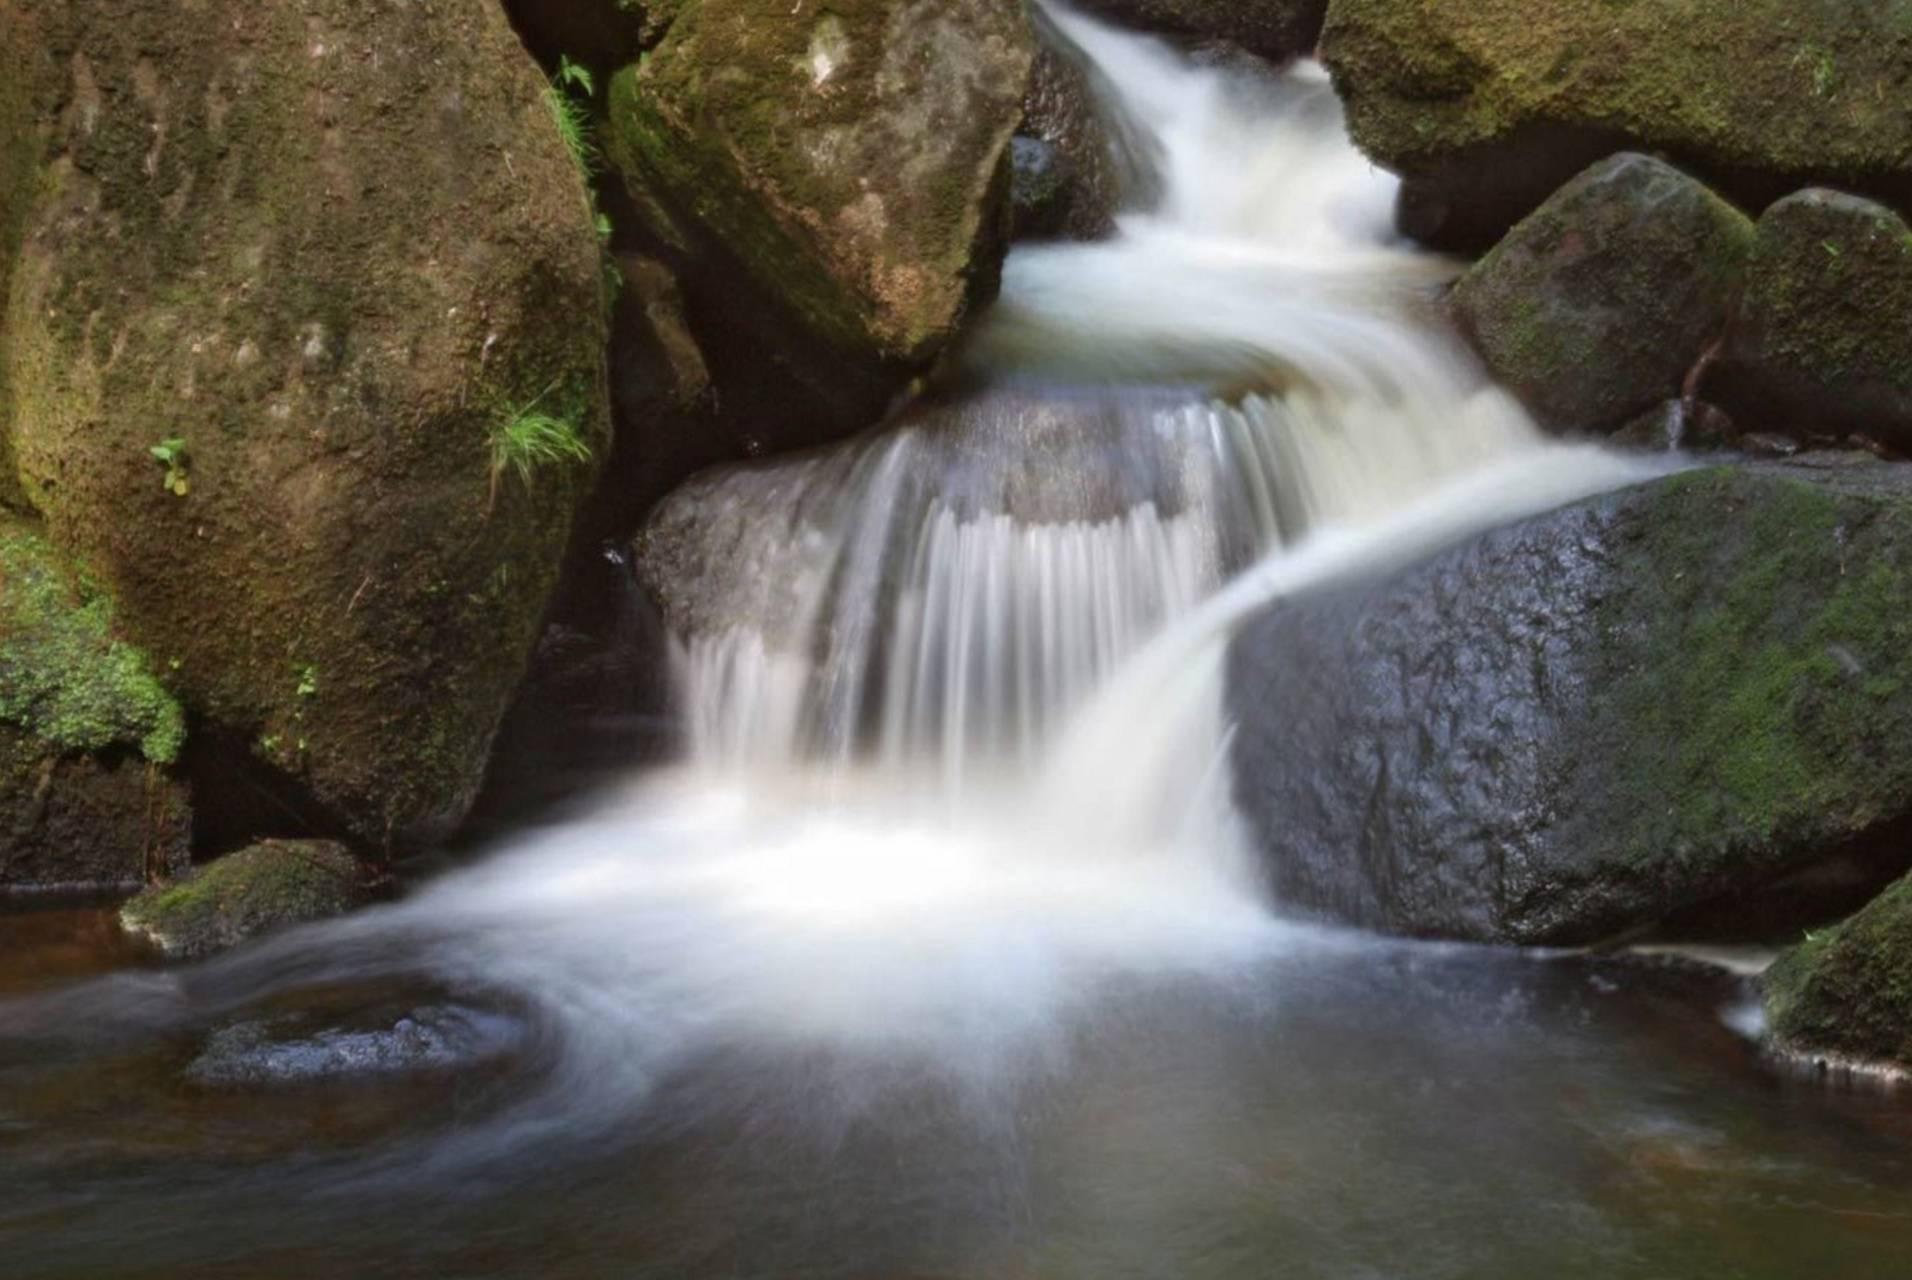 Stream And Rocks